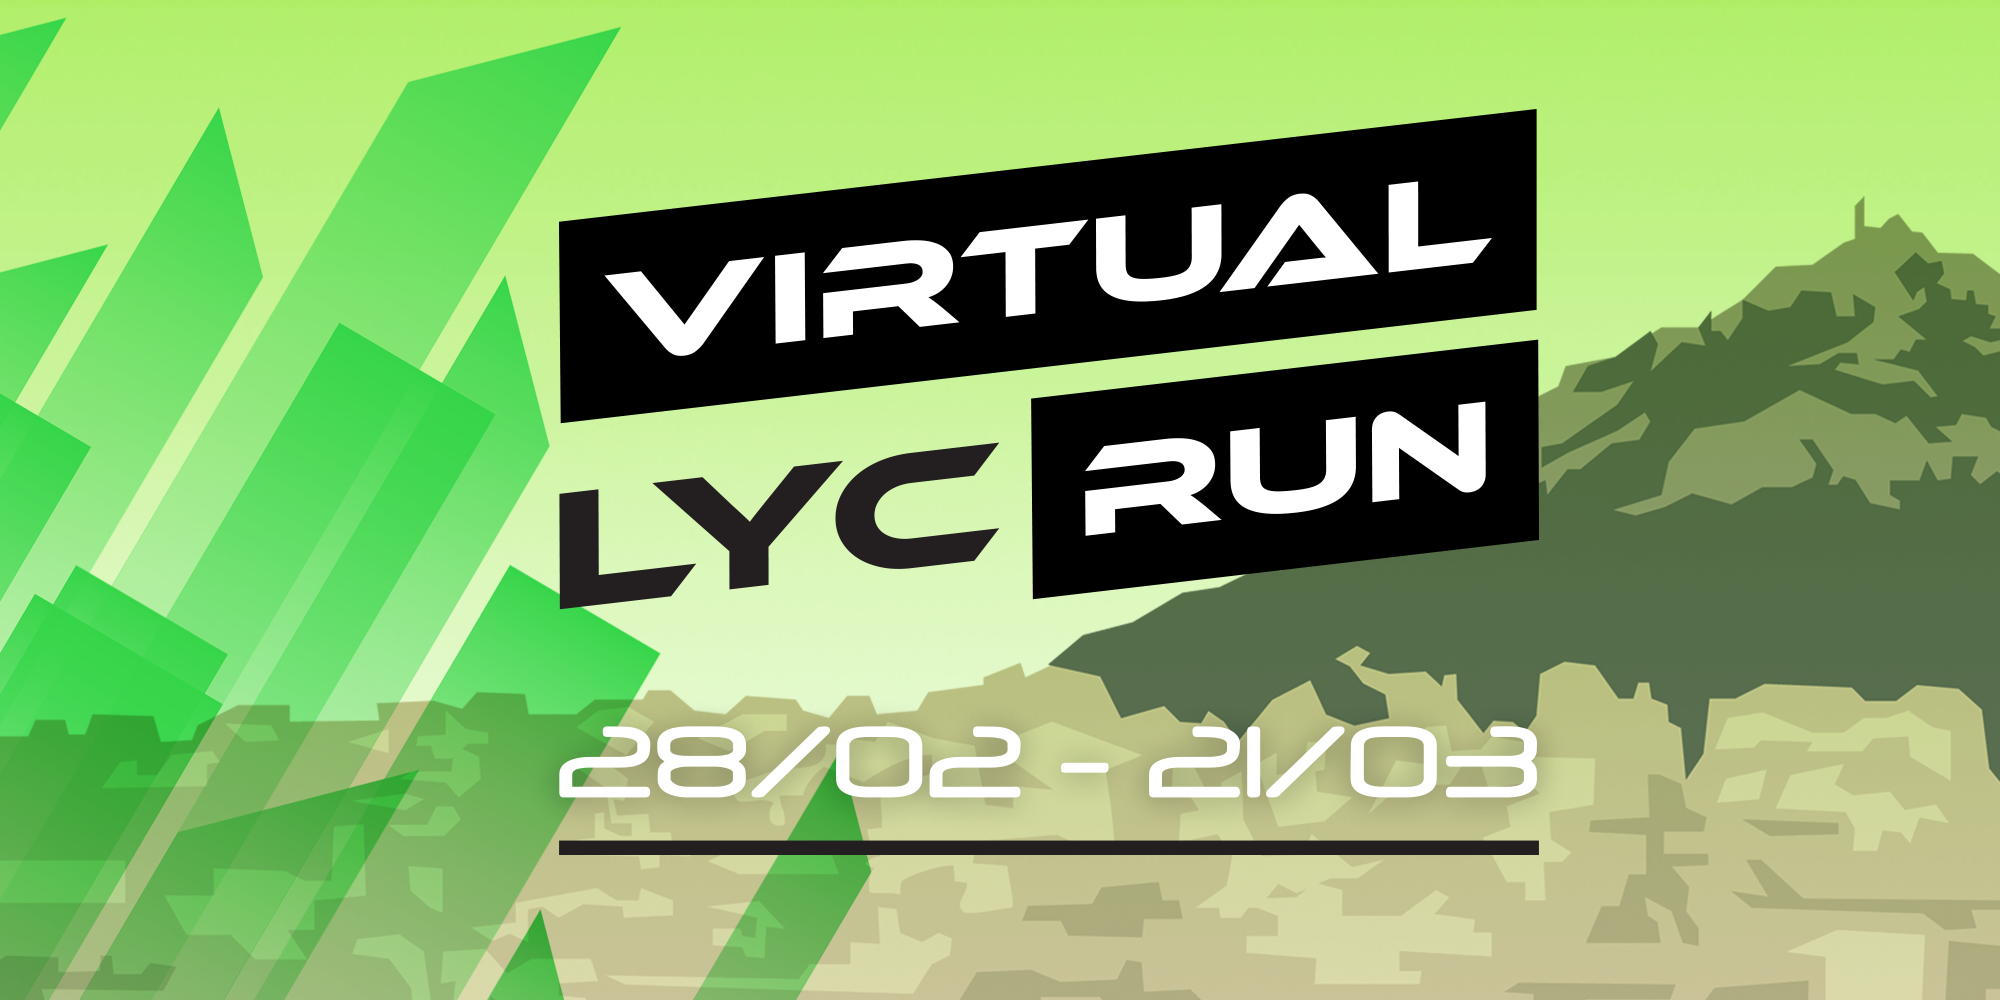 Virtual-Run-LYC-slideshow-2000x1000